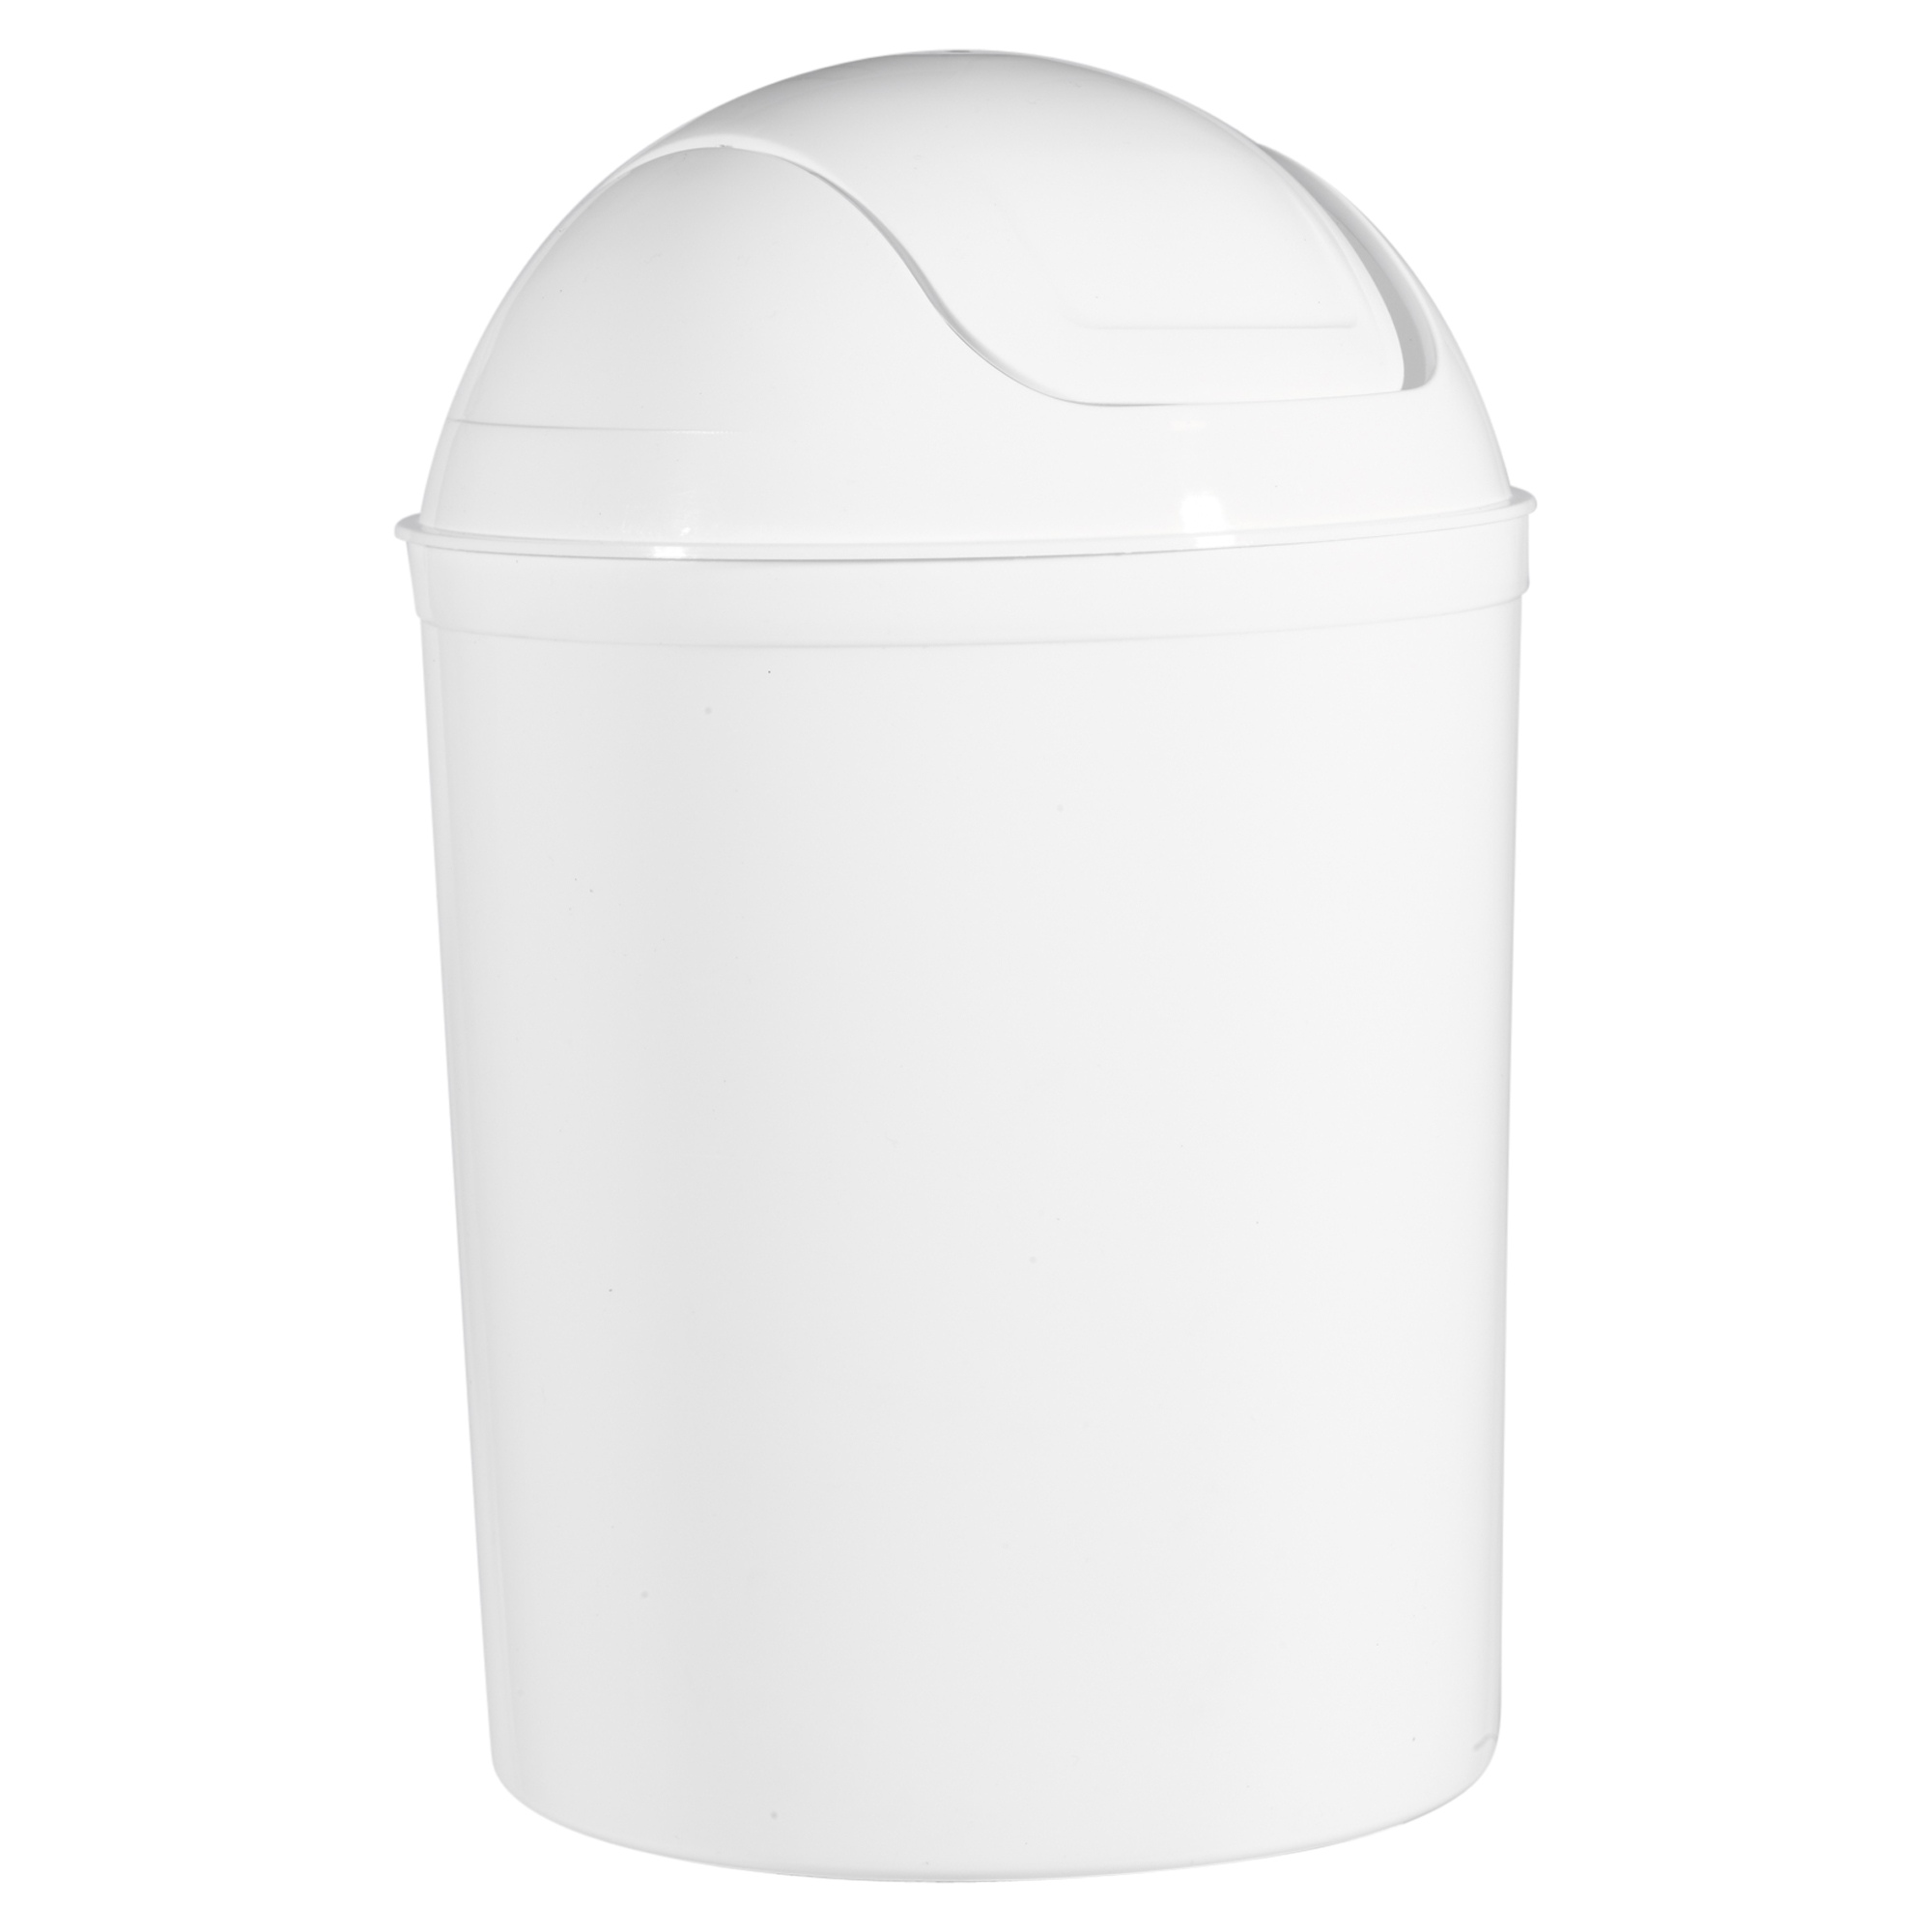 Plastic 5 Liter Swing Lid Waste Dustbin Rubbish Garbage Bin Bathroom Toilet